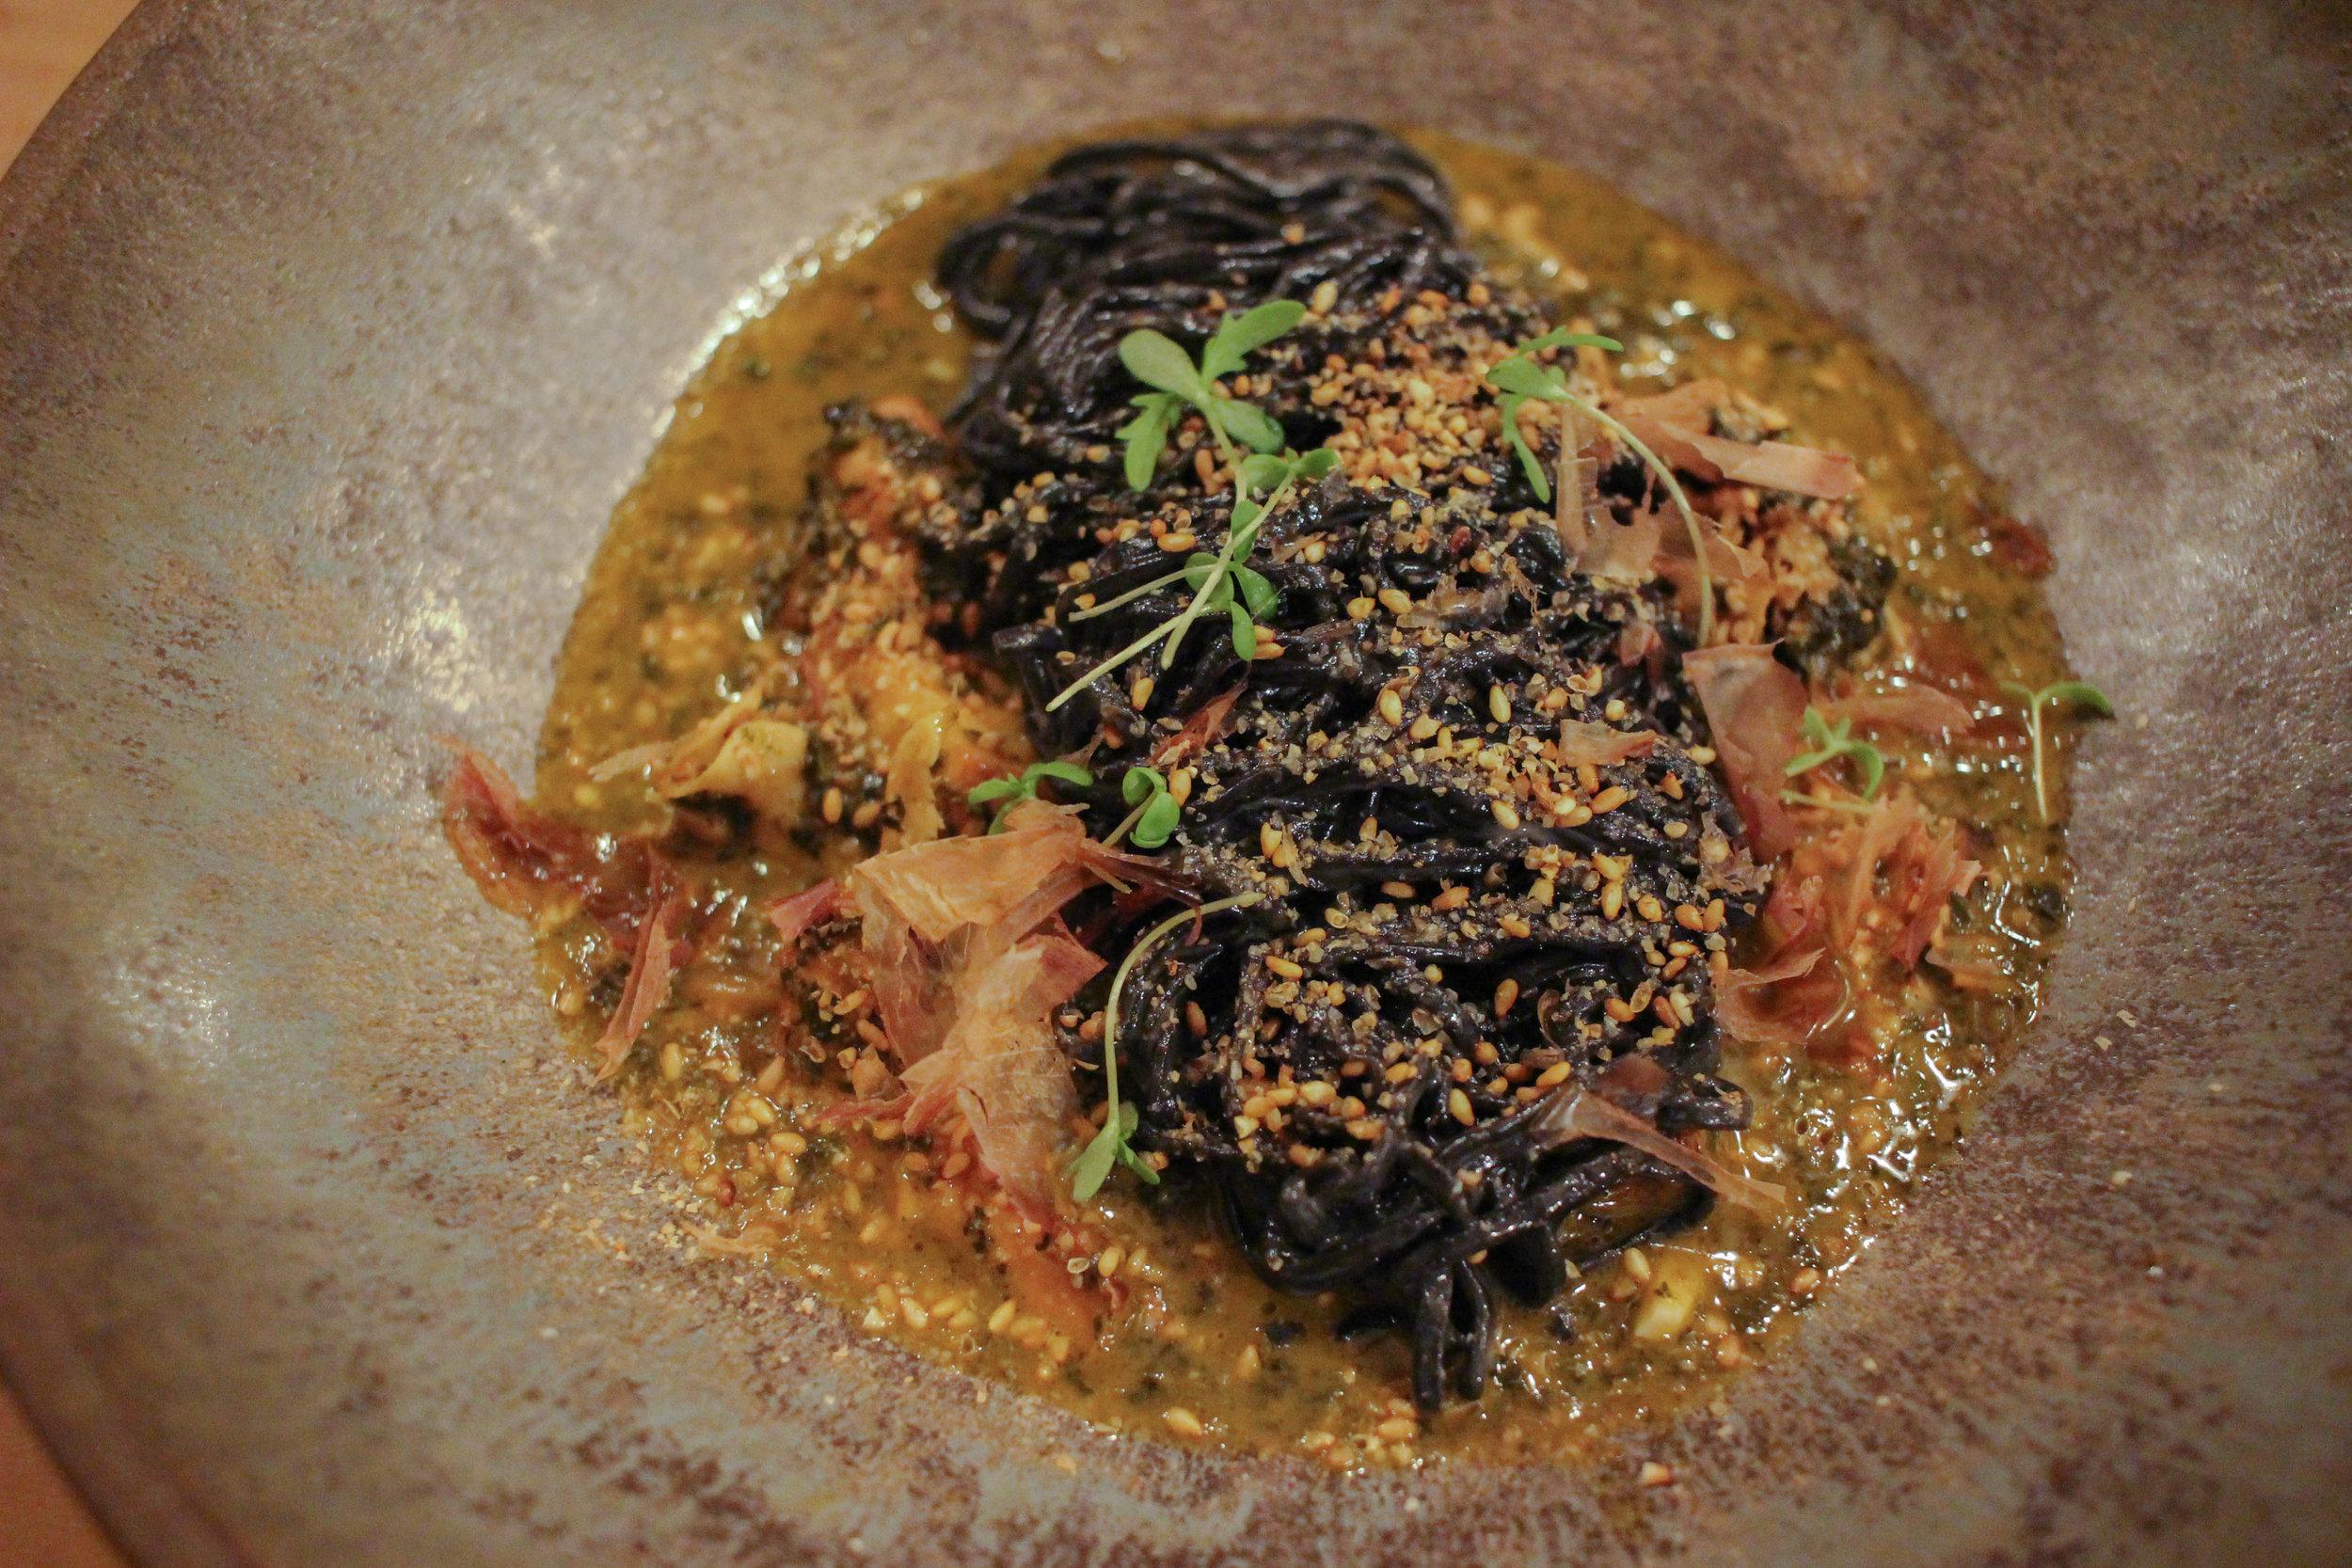 Squid ink noodles chanterelle mushrooms, kale & bonito flakes